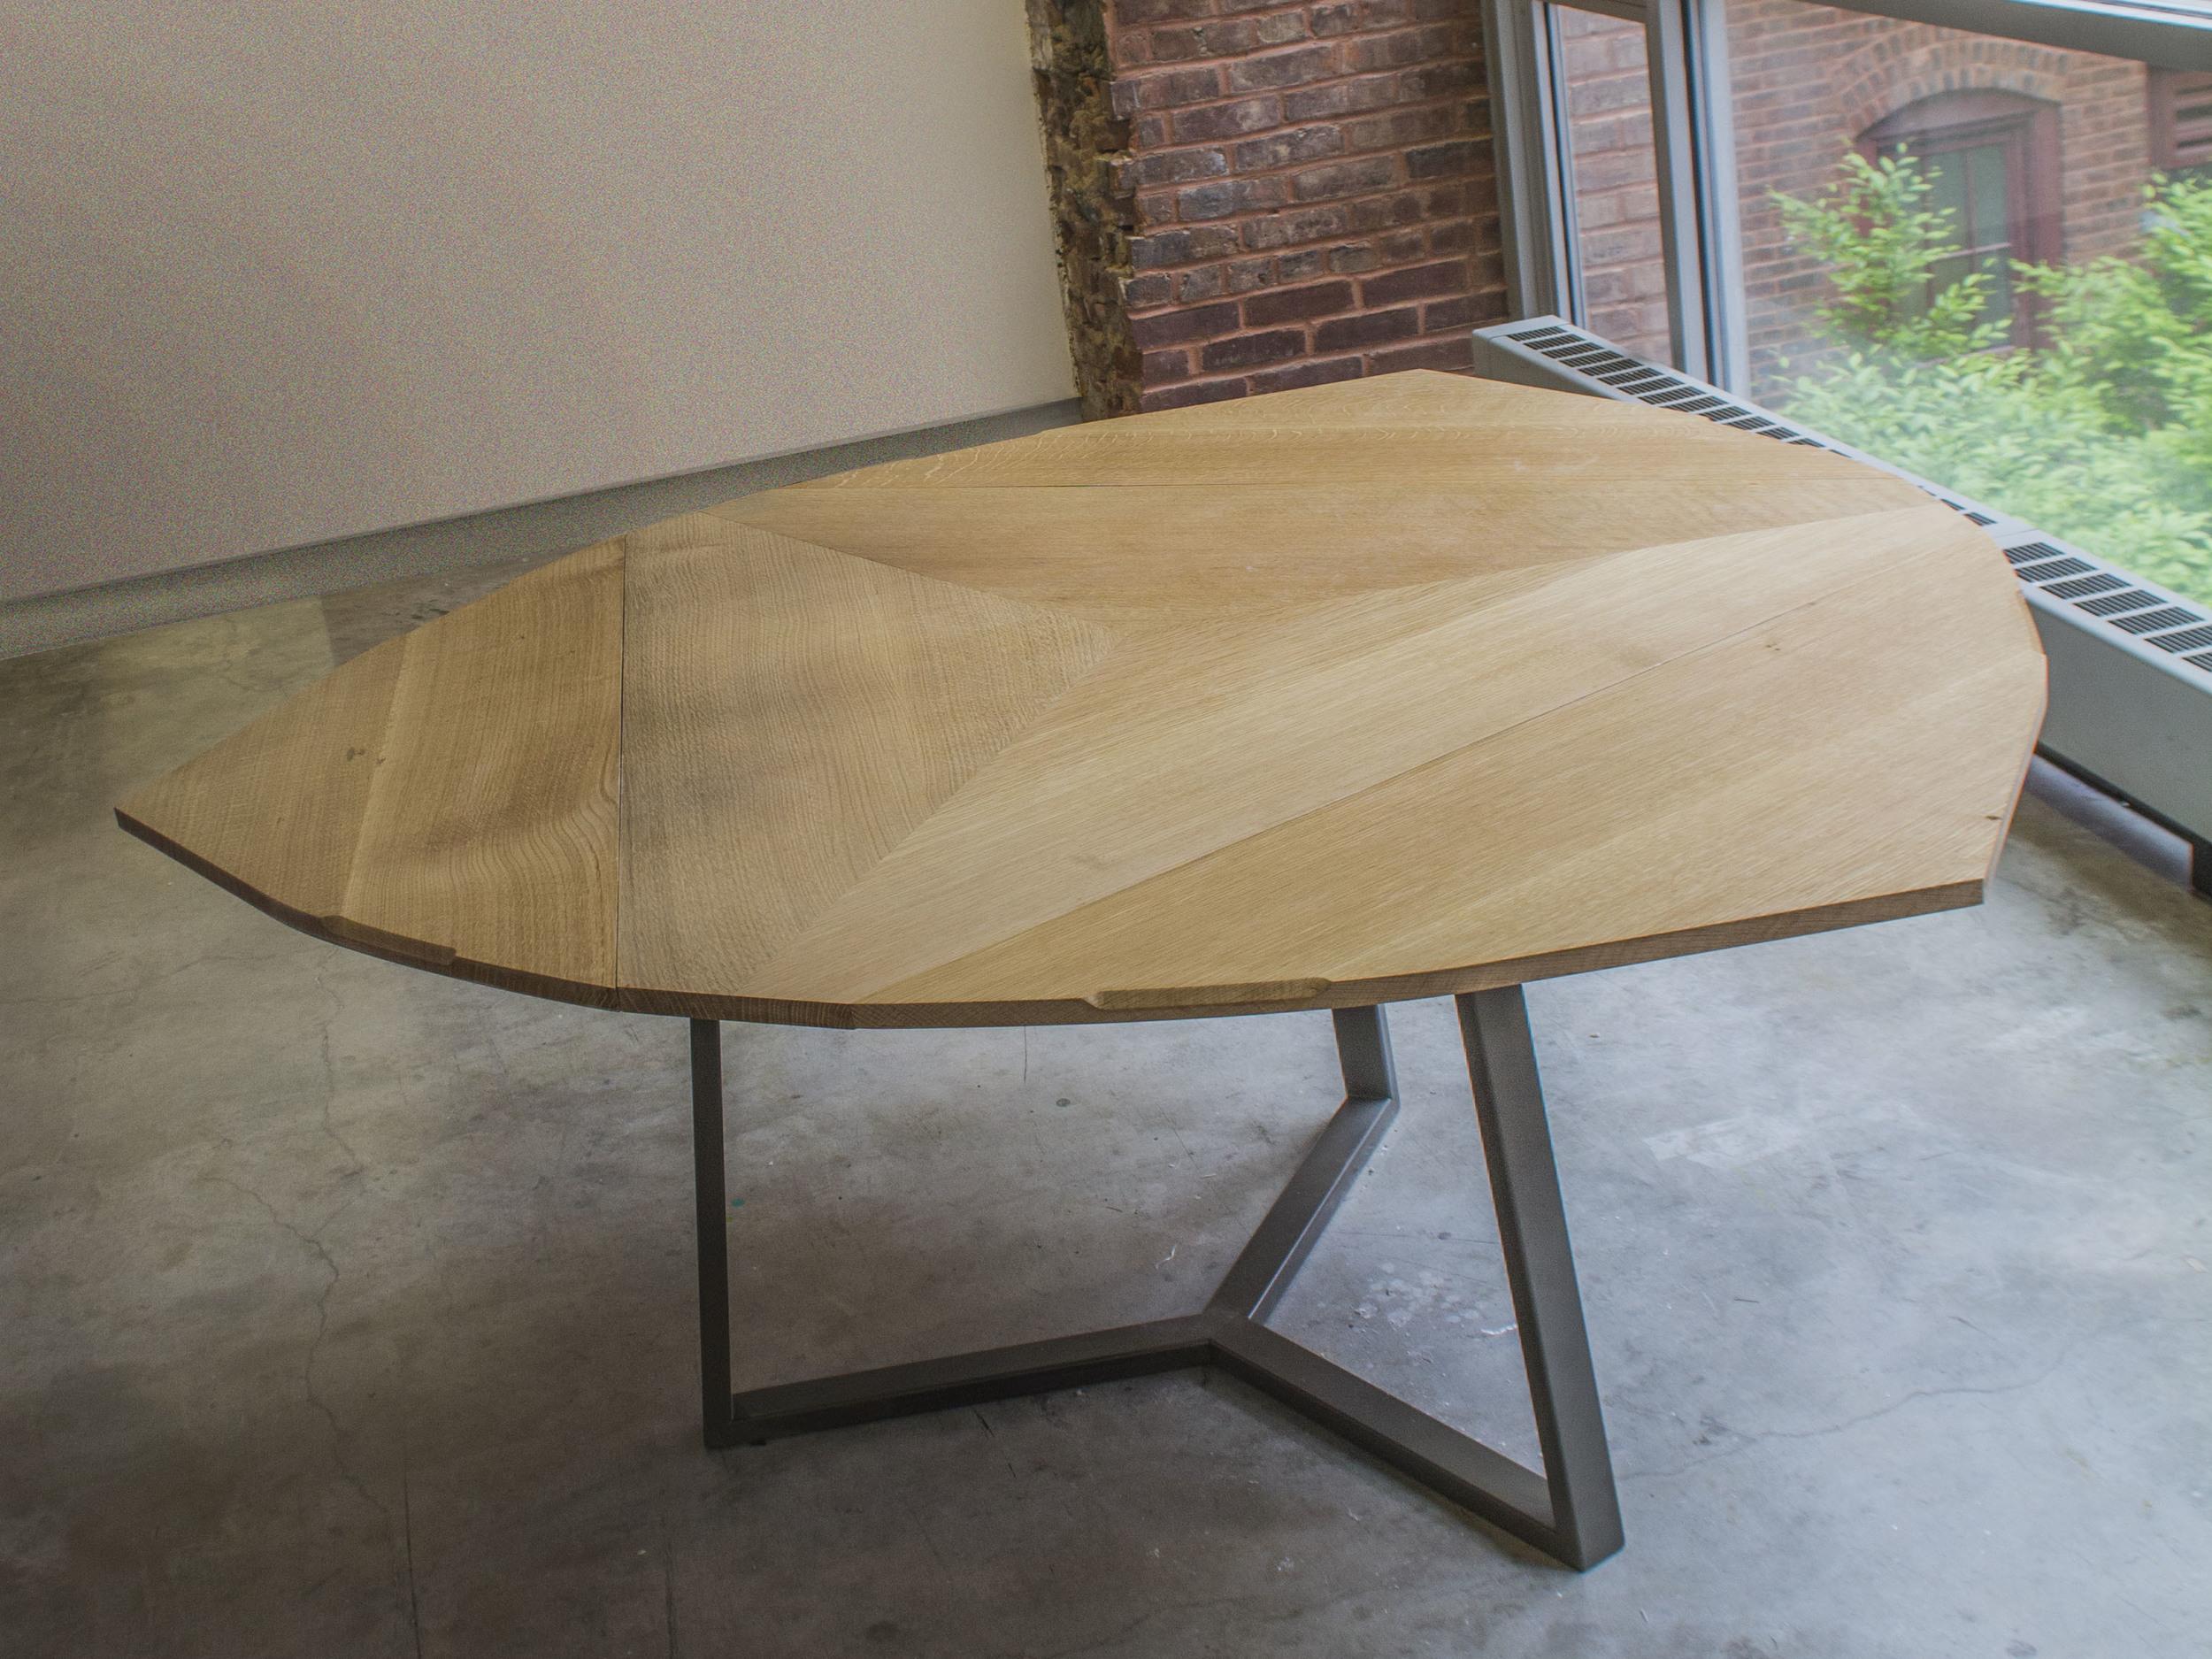 Table c.jpg